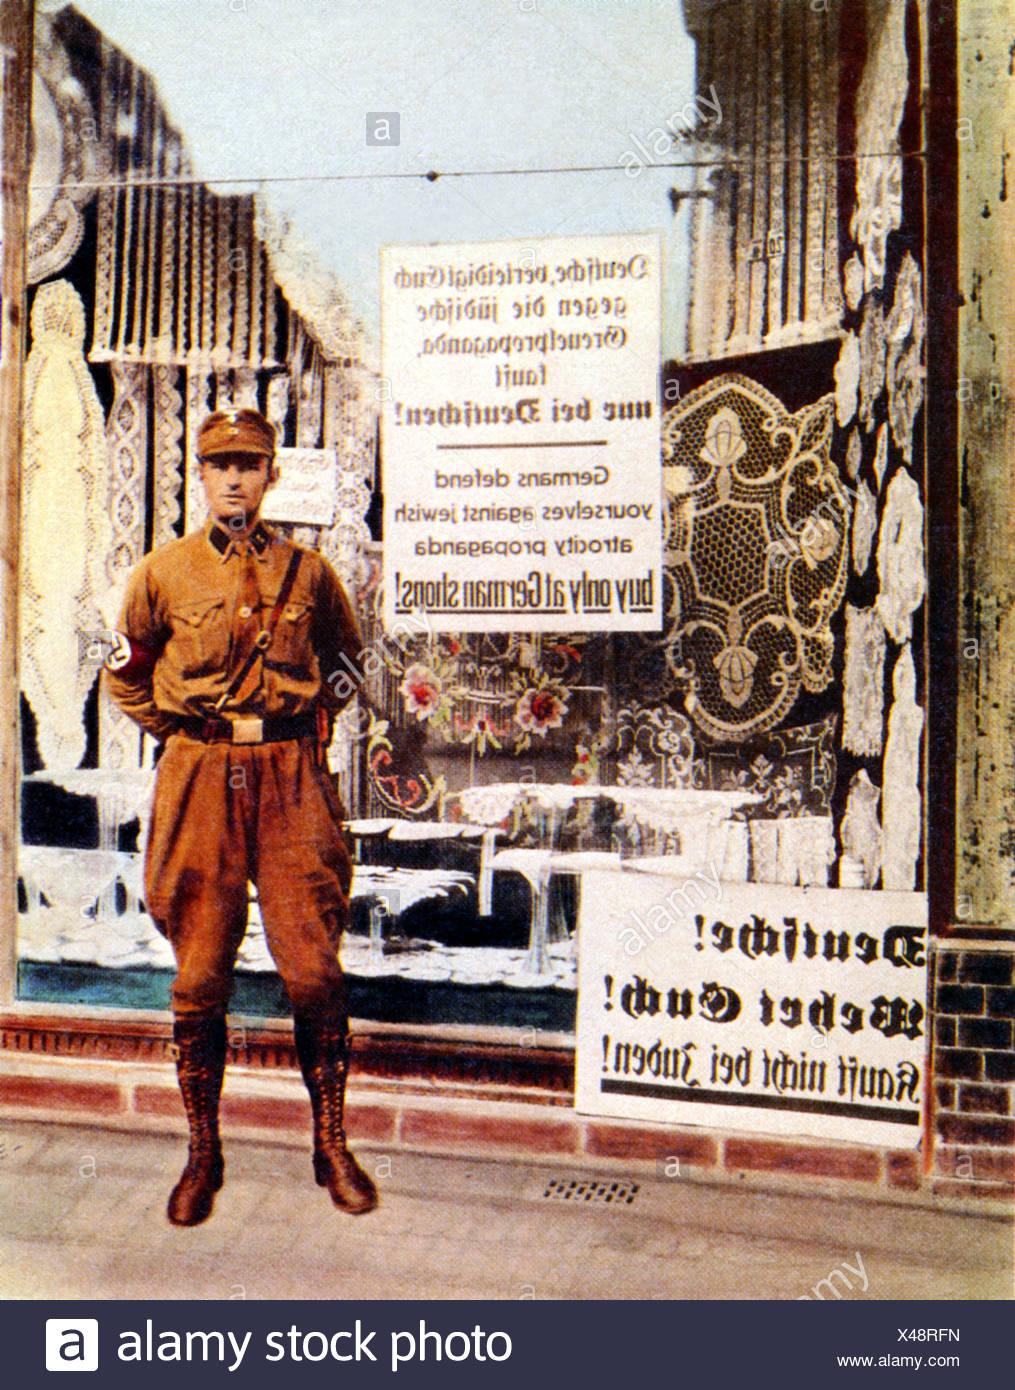 Brown, Shirt, Berlin, SA, standing, Jewish, store, propaganda, buy, German, shops, boycott, Germany, Third Reich, Tinted, photol Stock Photo